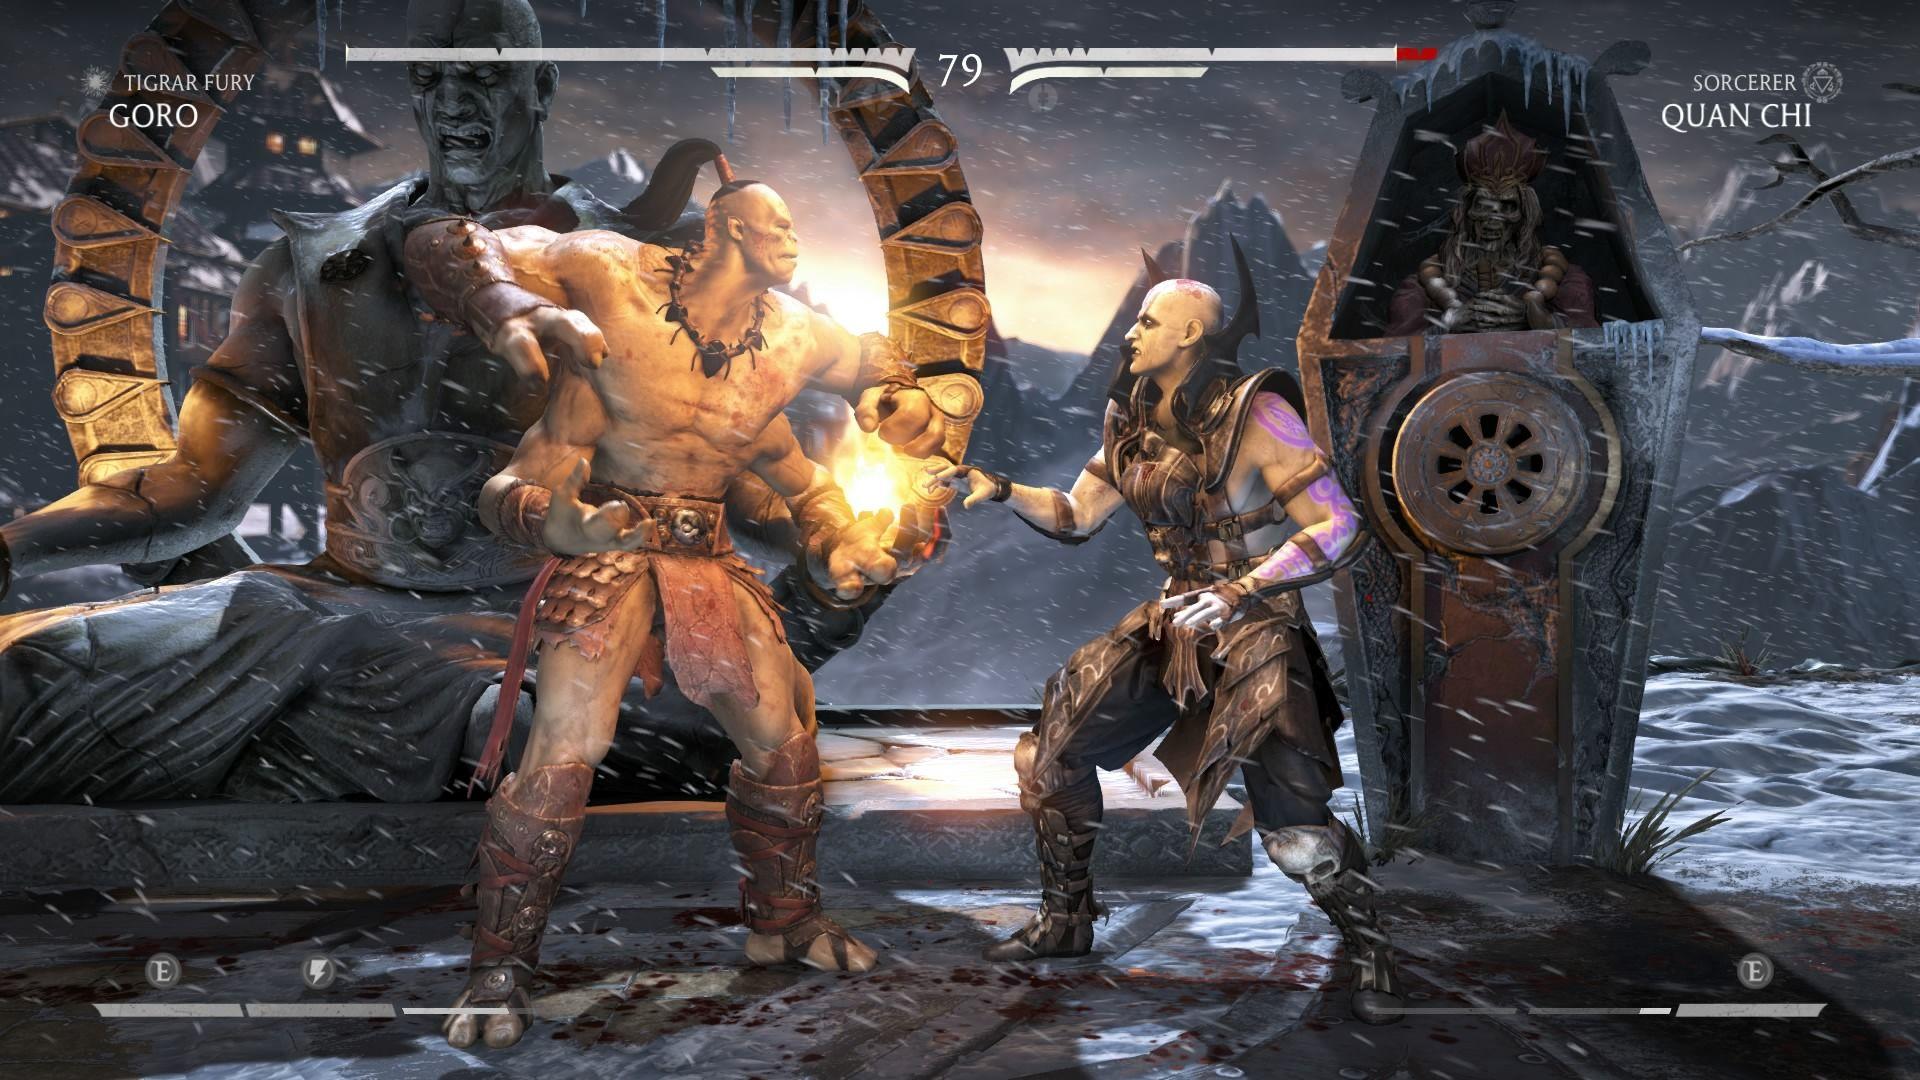 Mortal Kombat X Hack 2018 - How To Get Free Souls, Koins